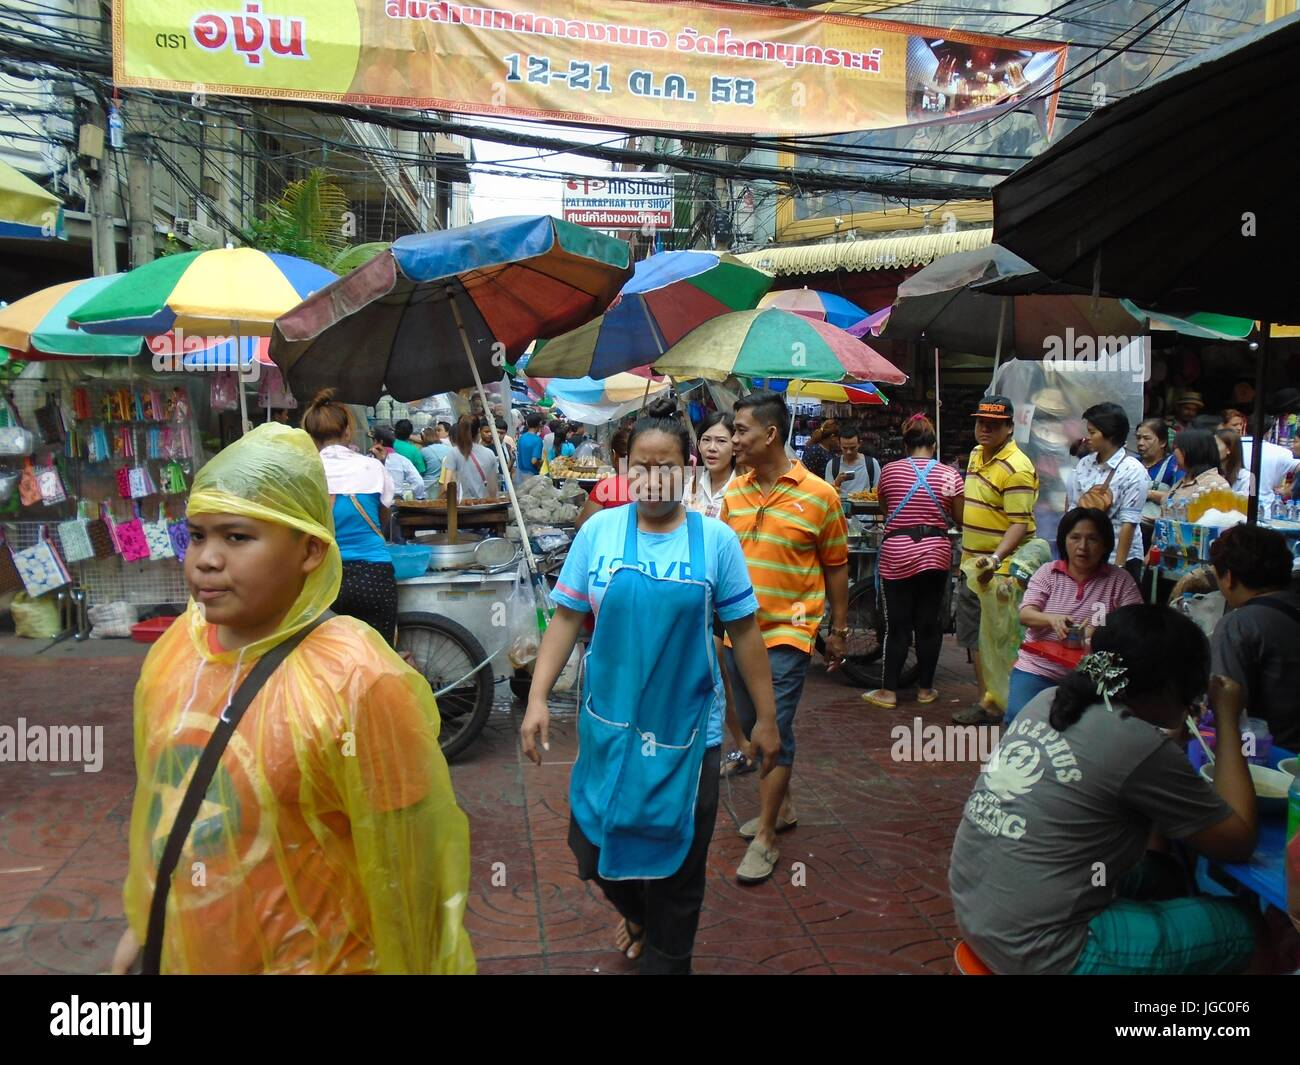 Chinatown Bangkok Thailand South East Asia - Stock Image